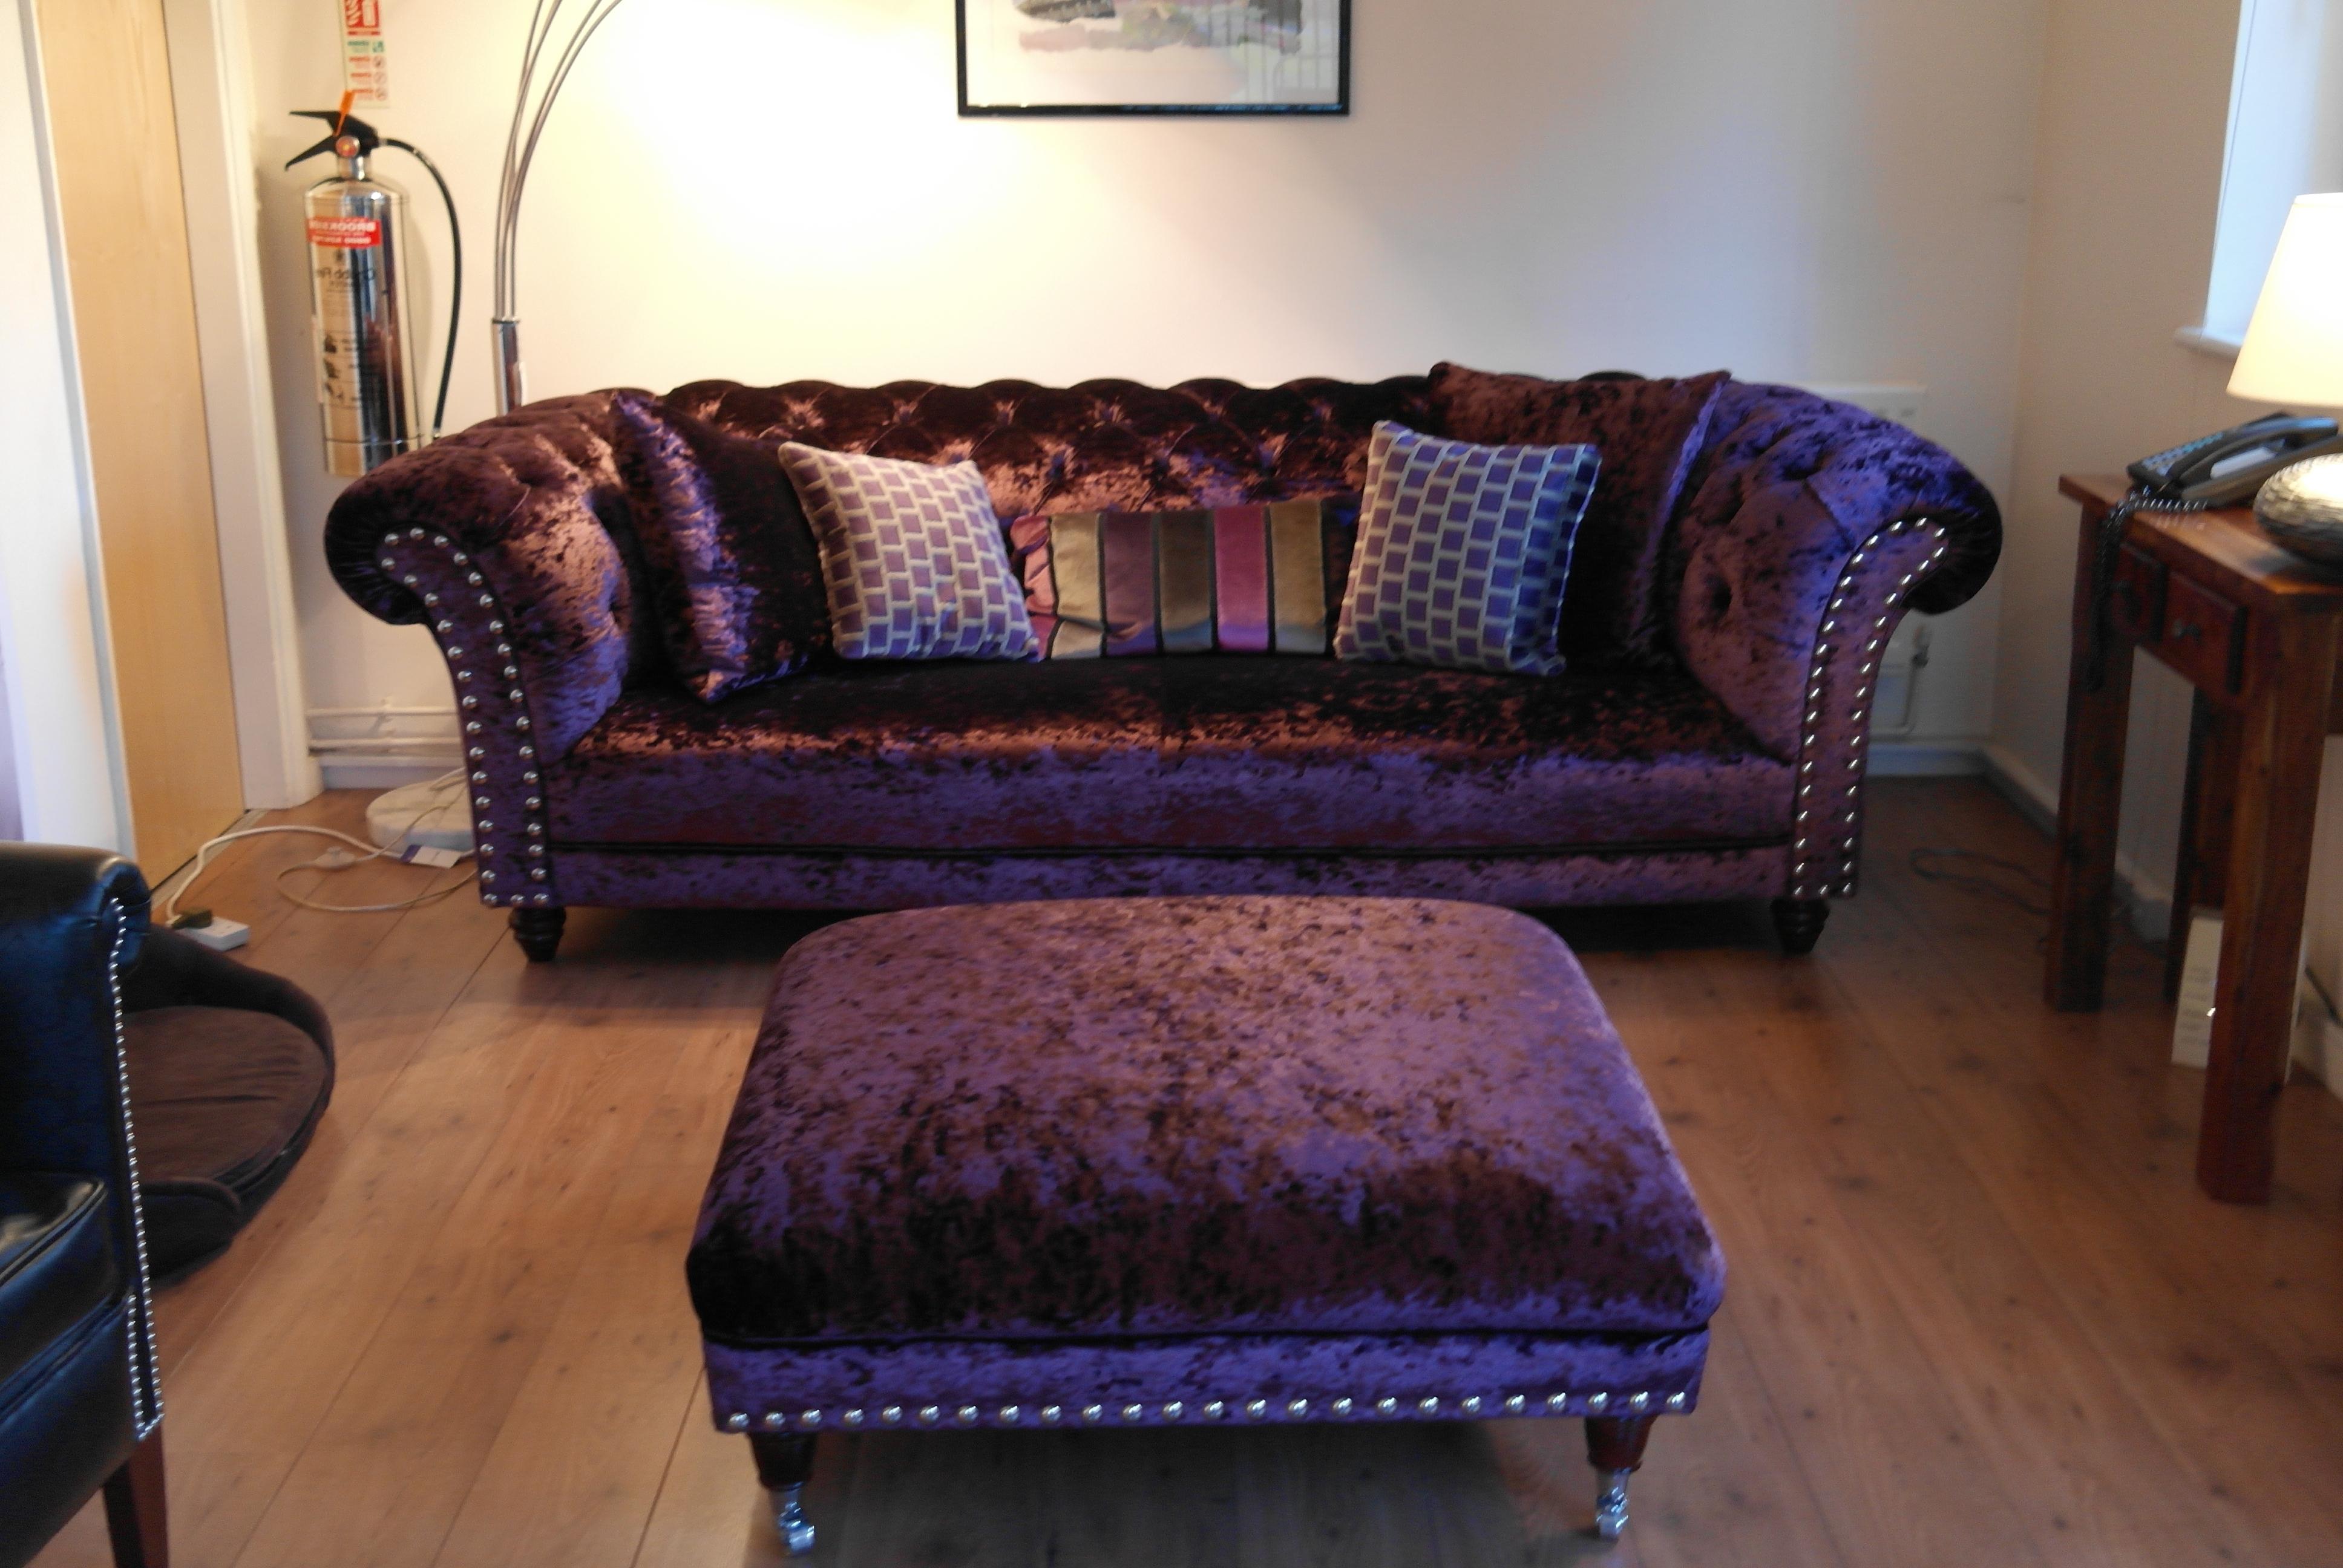 Sophisticated Velvet Tufted Sofa For Living Room Furniture Ideas In Widely Used Velvet Purple Sofas (View 15 of 20)